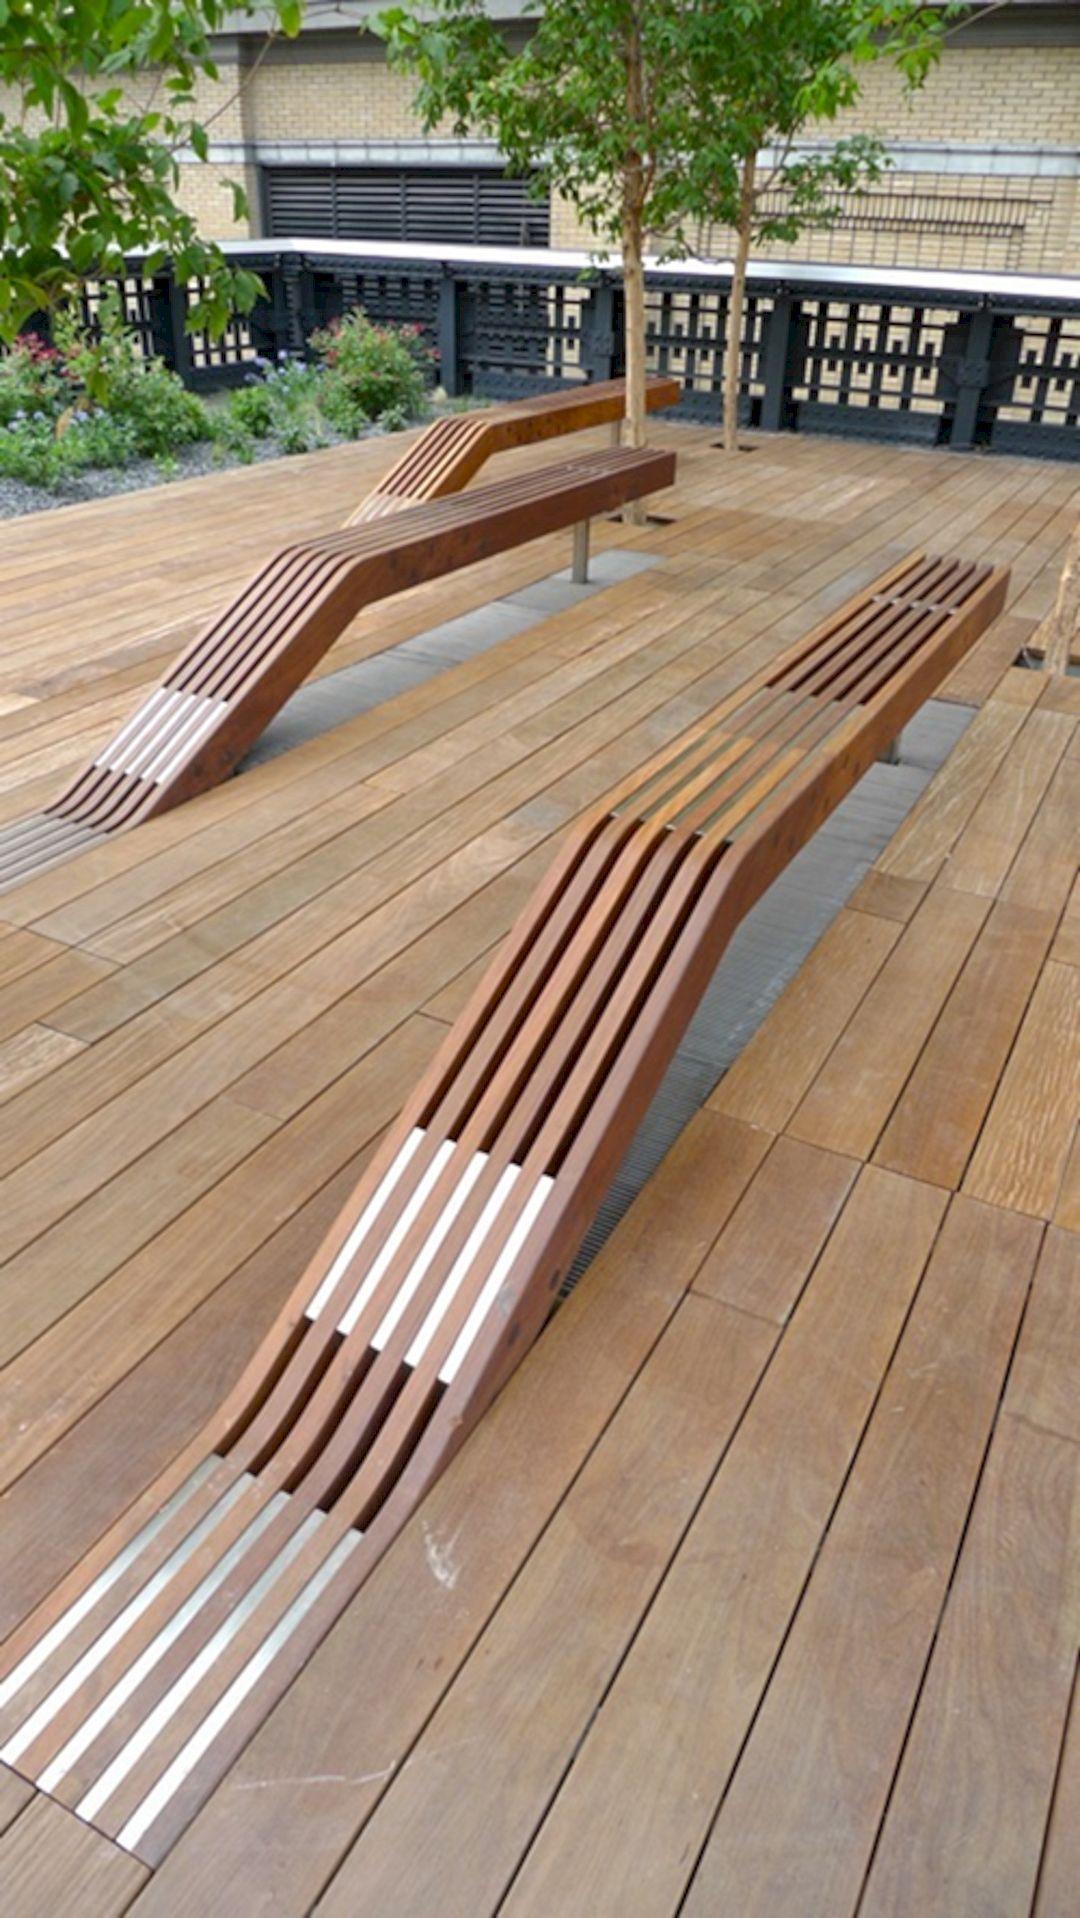 urban furniture designs. Impressive Urban Public Seating Designs Furniture T